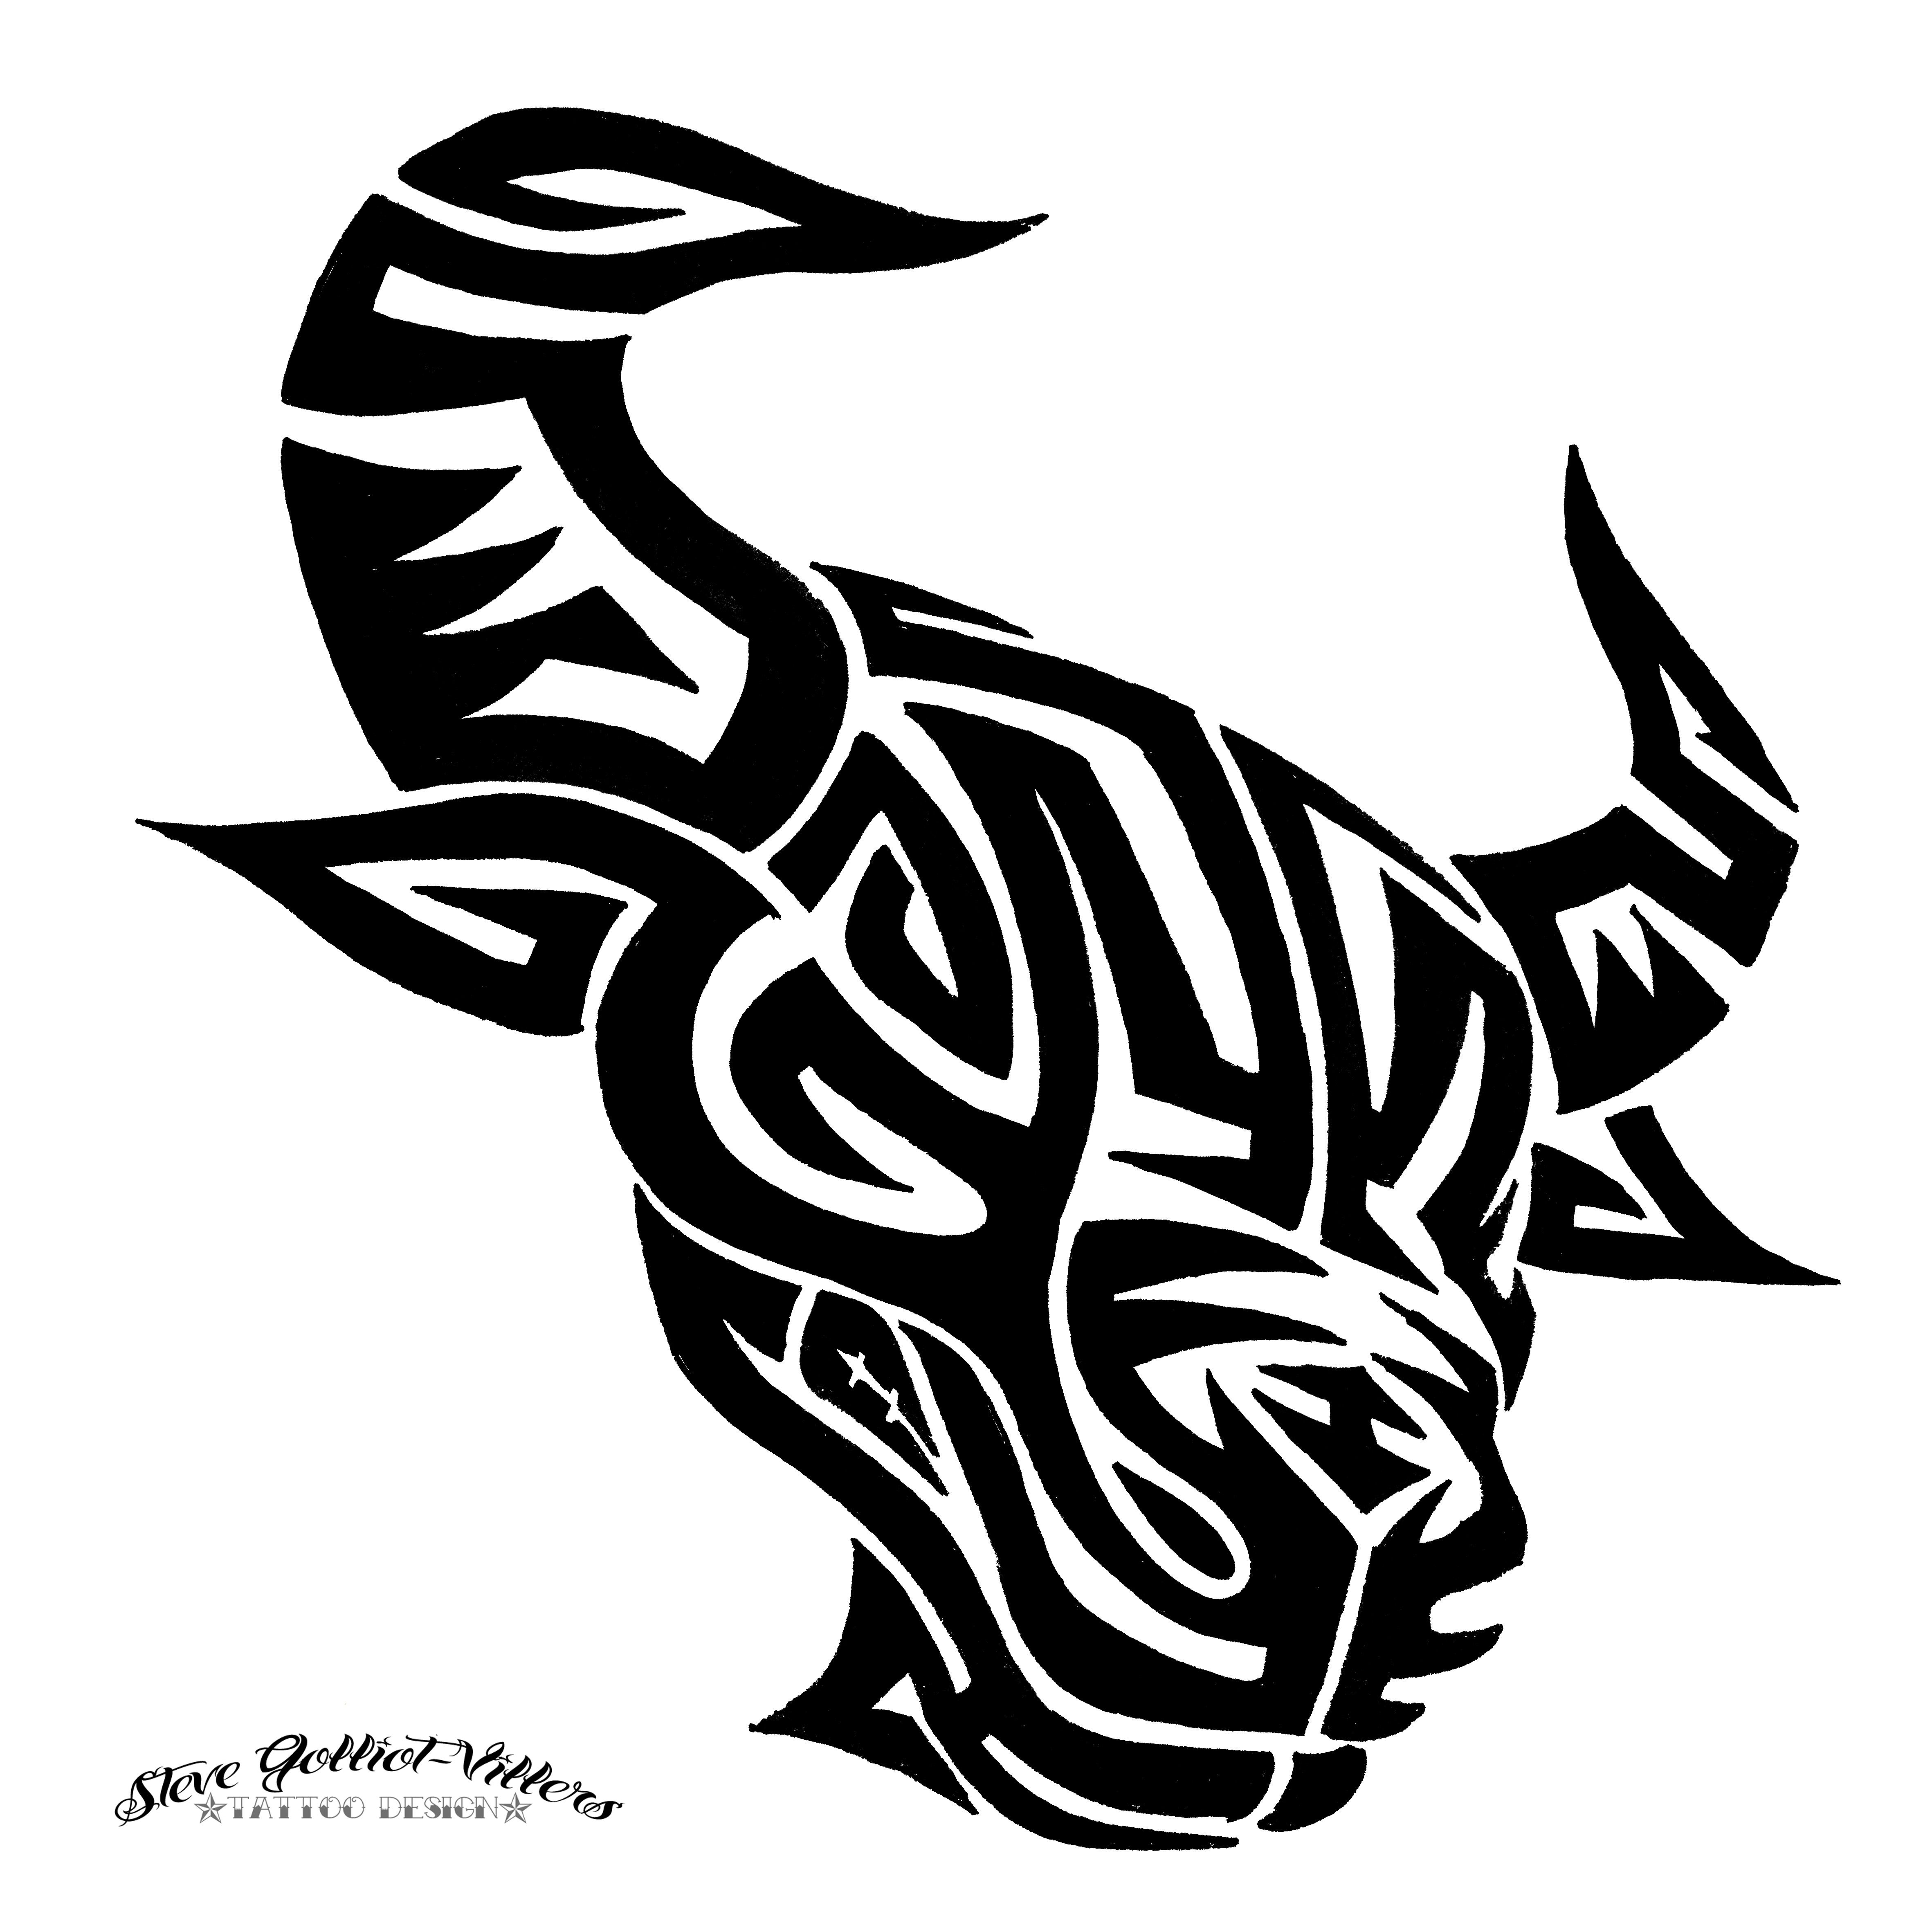 042d3395e bull tribal tattoos - Google Search | Stencils and Tattoos | Bull ...